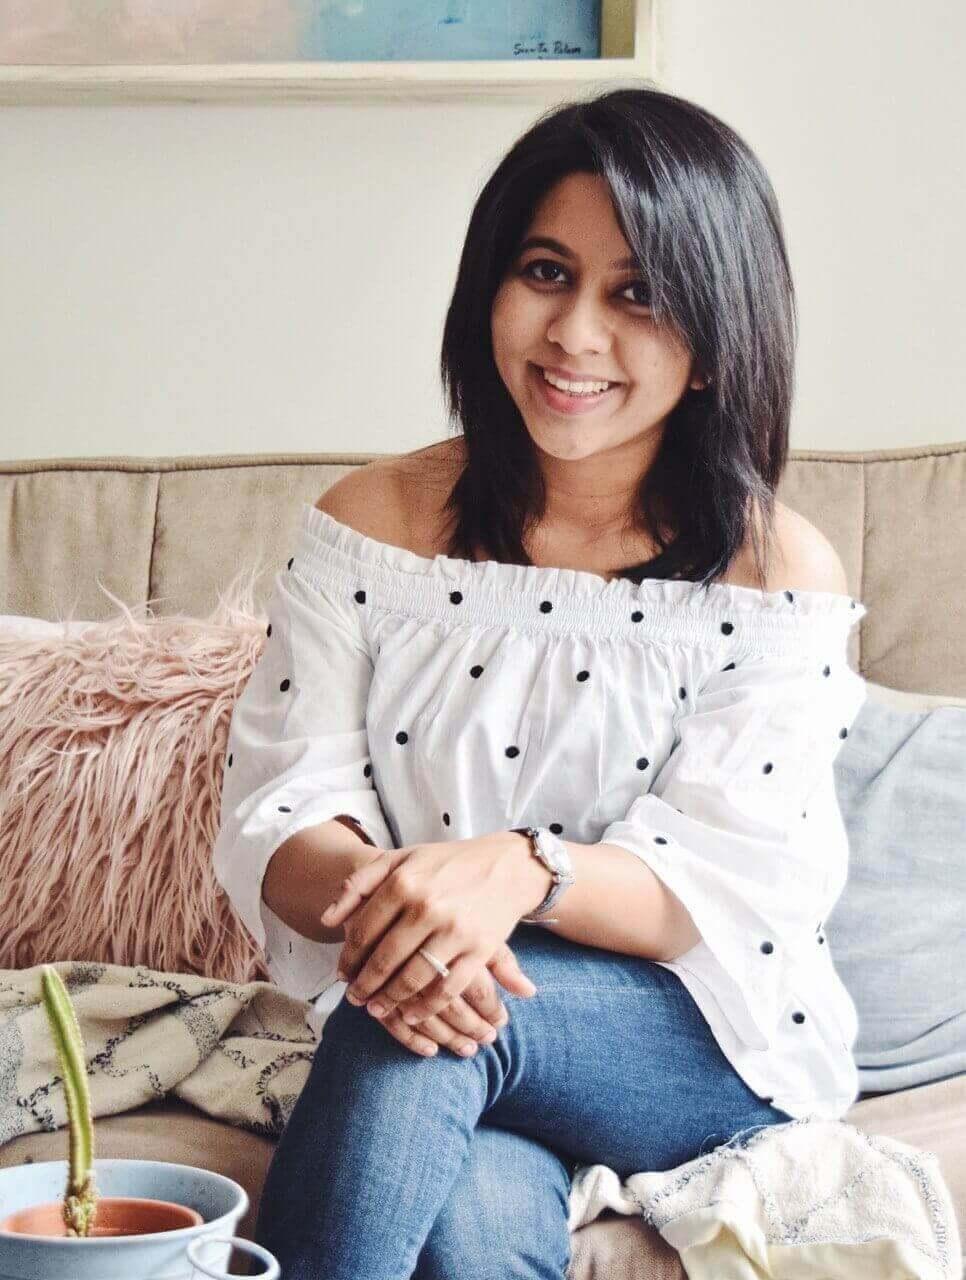 In conversation with Sunita Yogesh, Interior designer based in Chennai